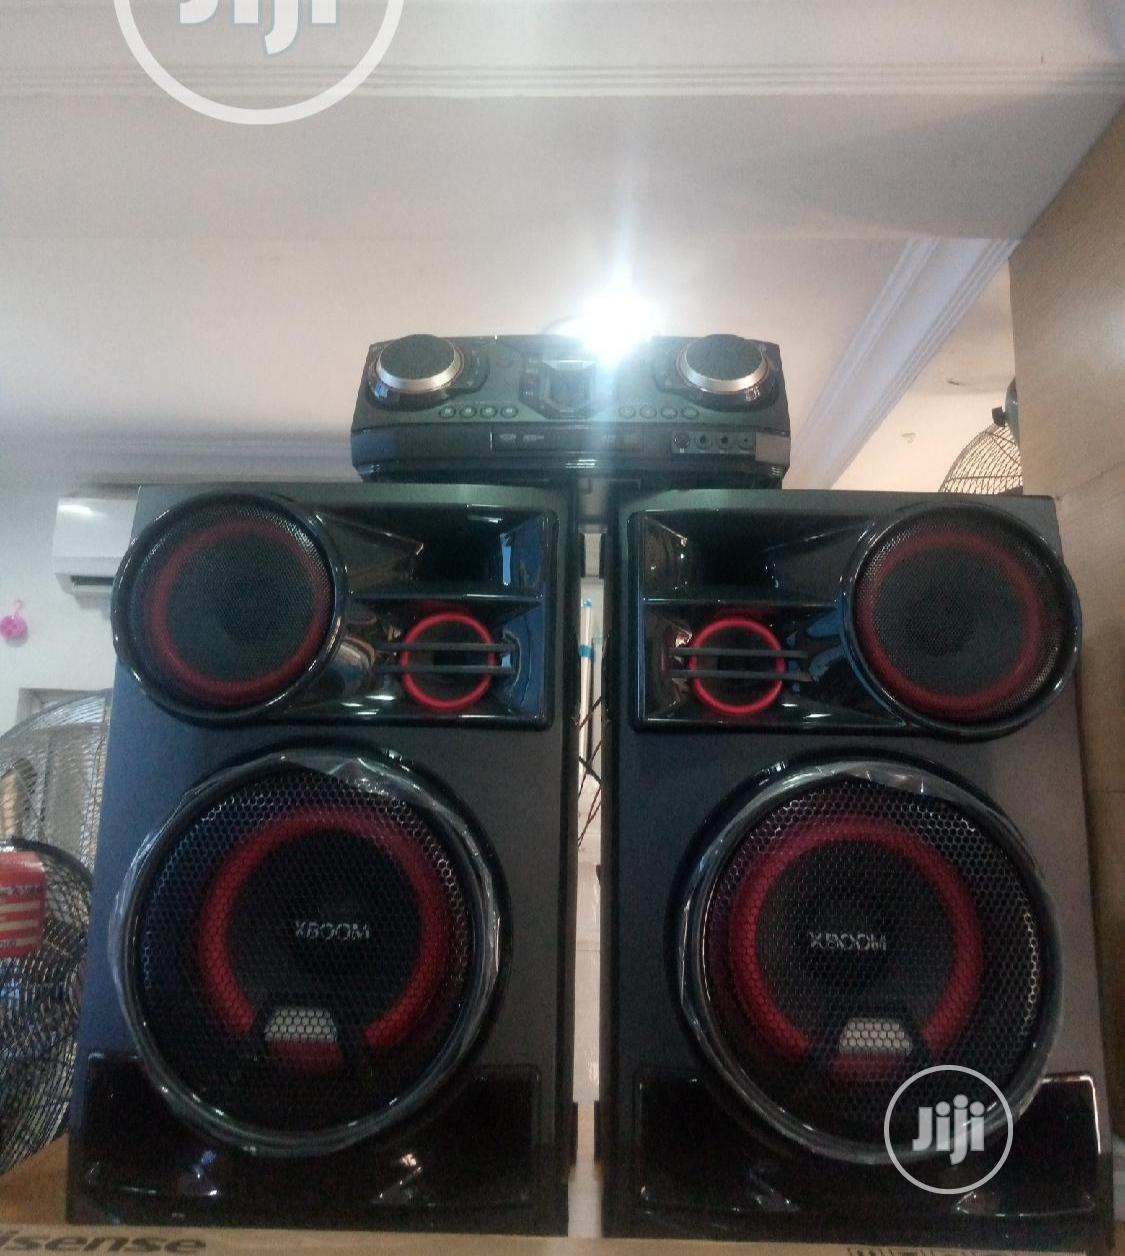 LG Xboom 3500W Entertainment System(Karaoke S DJ Effects